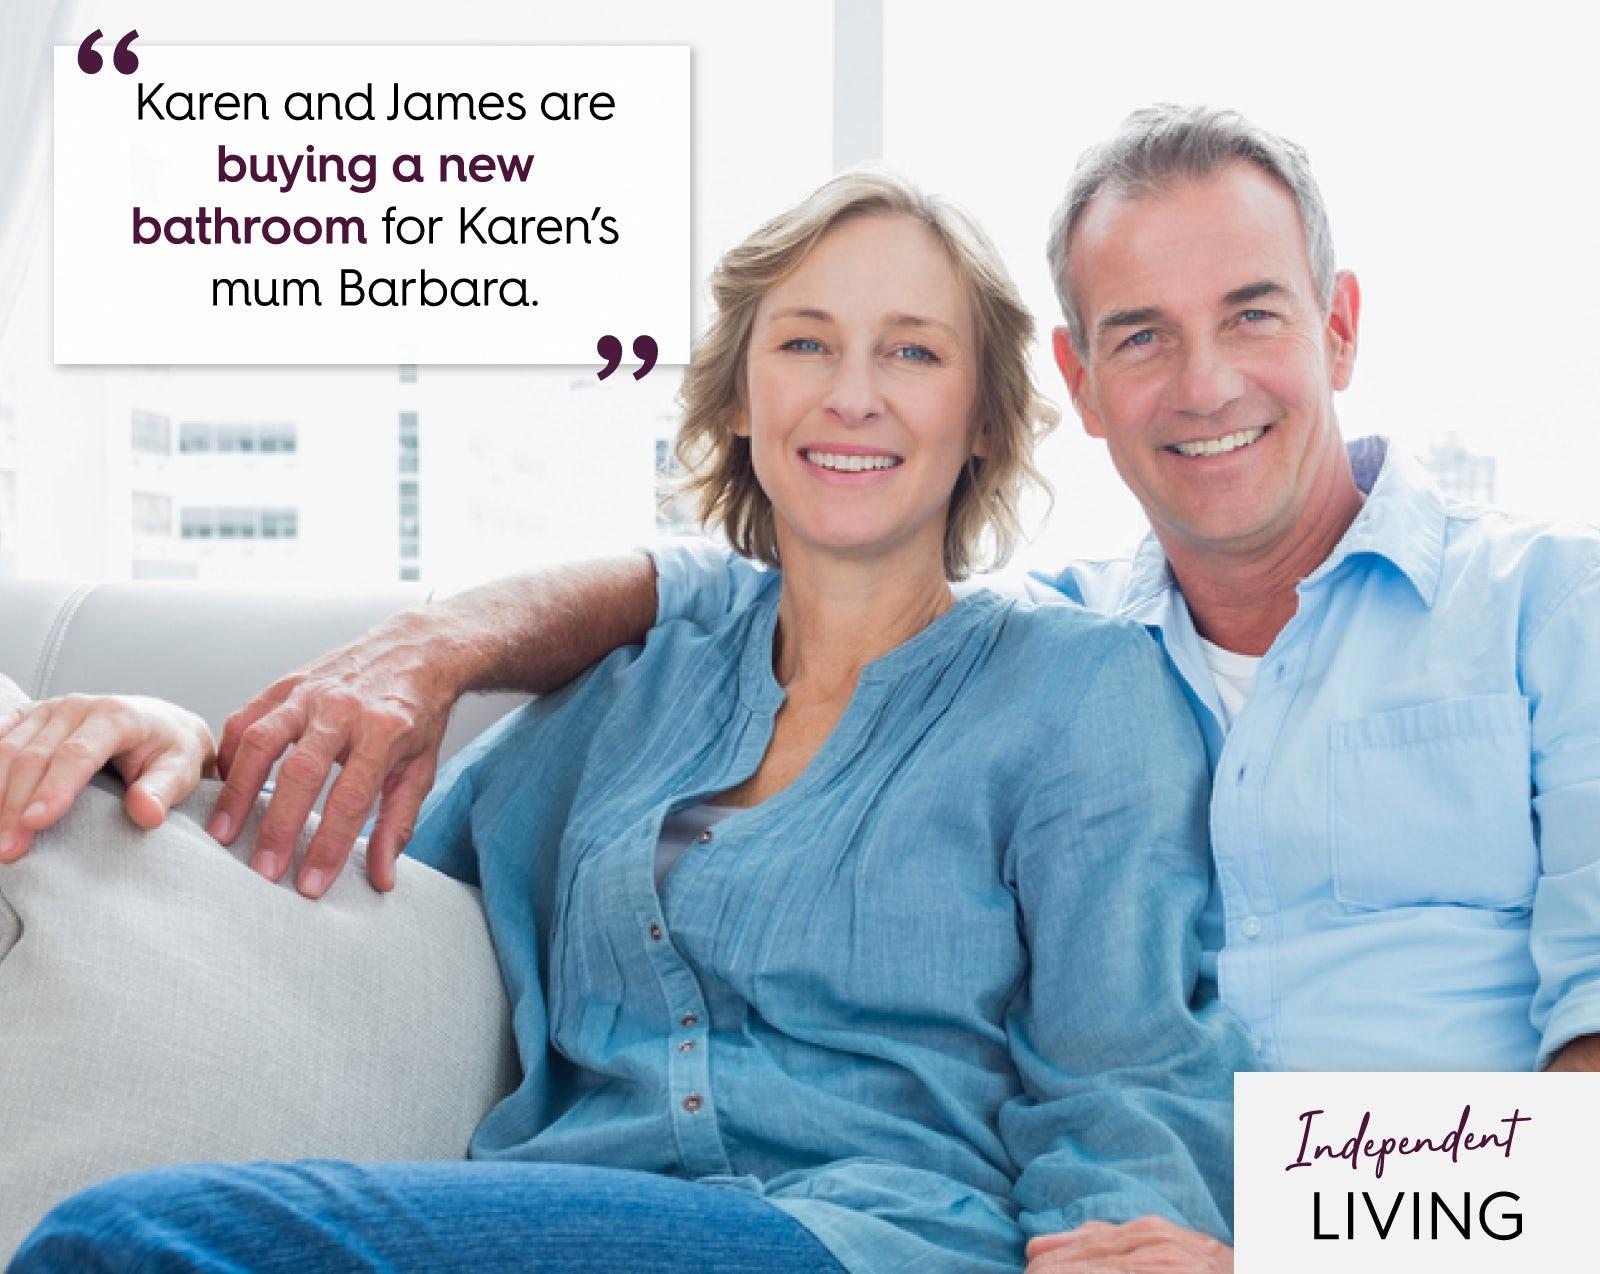 James & Karen